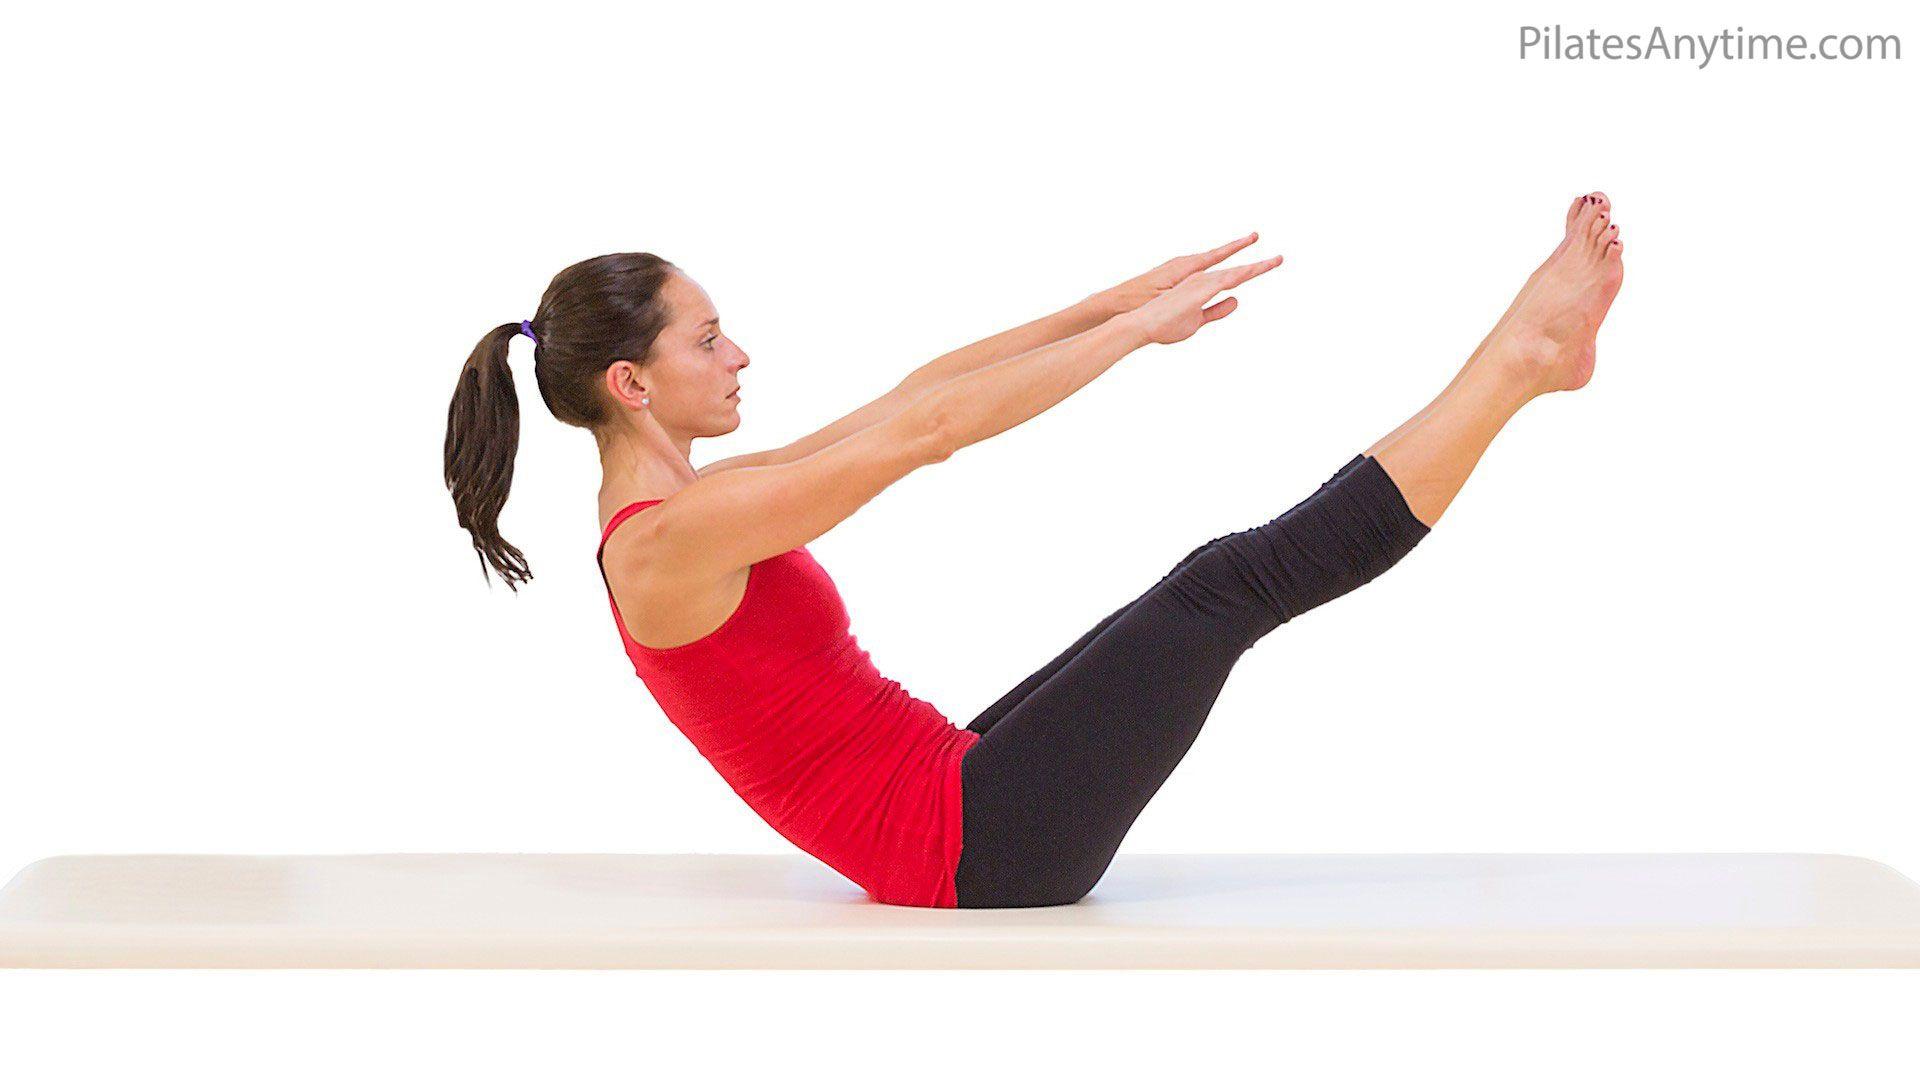 Teaser | Pilates workout, Mat pilates workout, Pilates